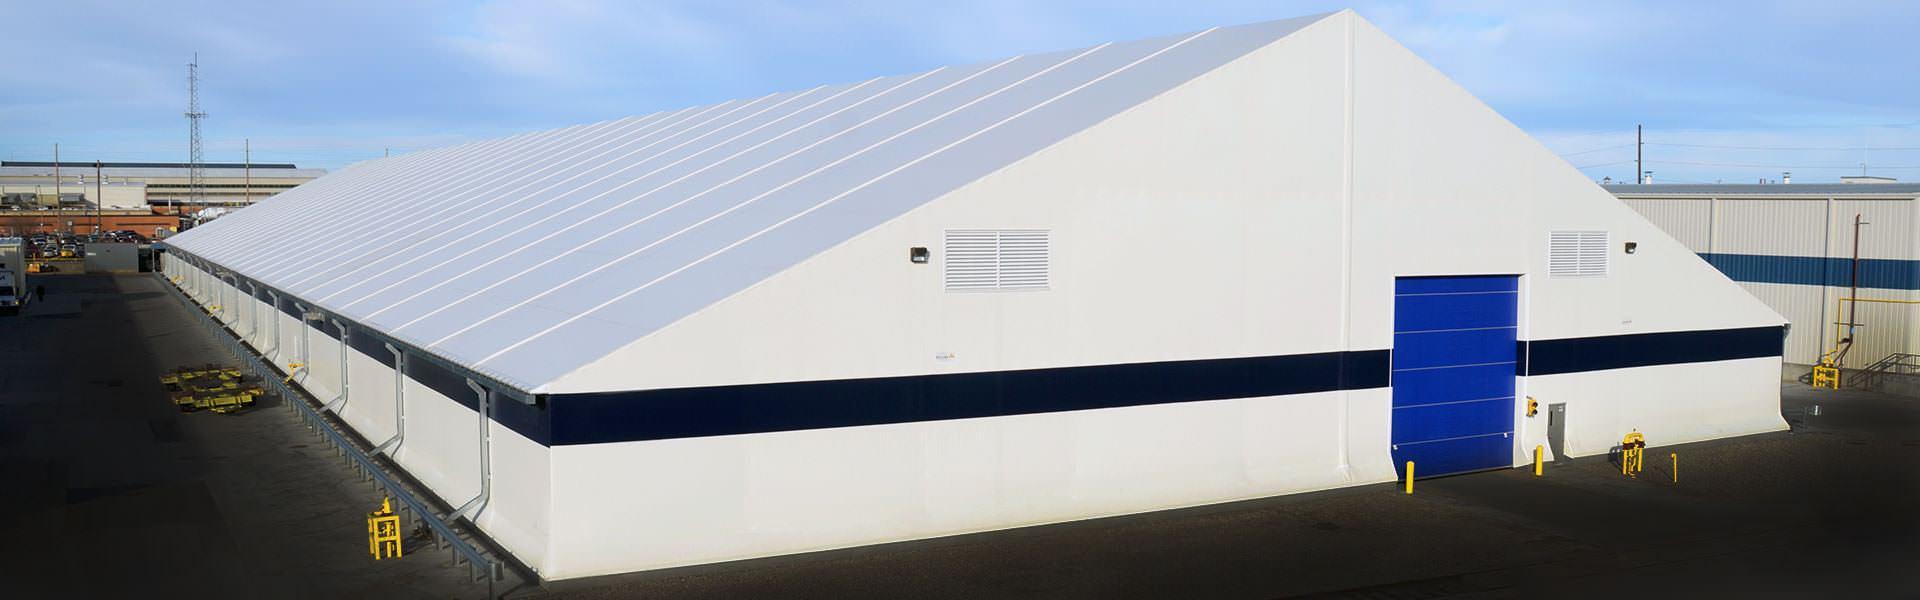 aviation-hangar-MRO-techOps-storage-fabric-structure